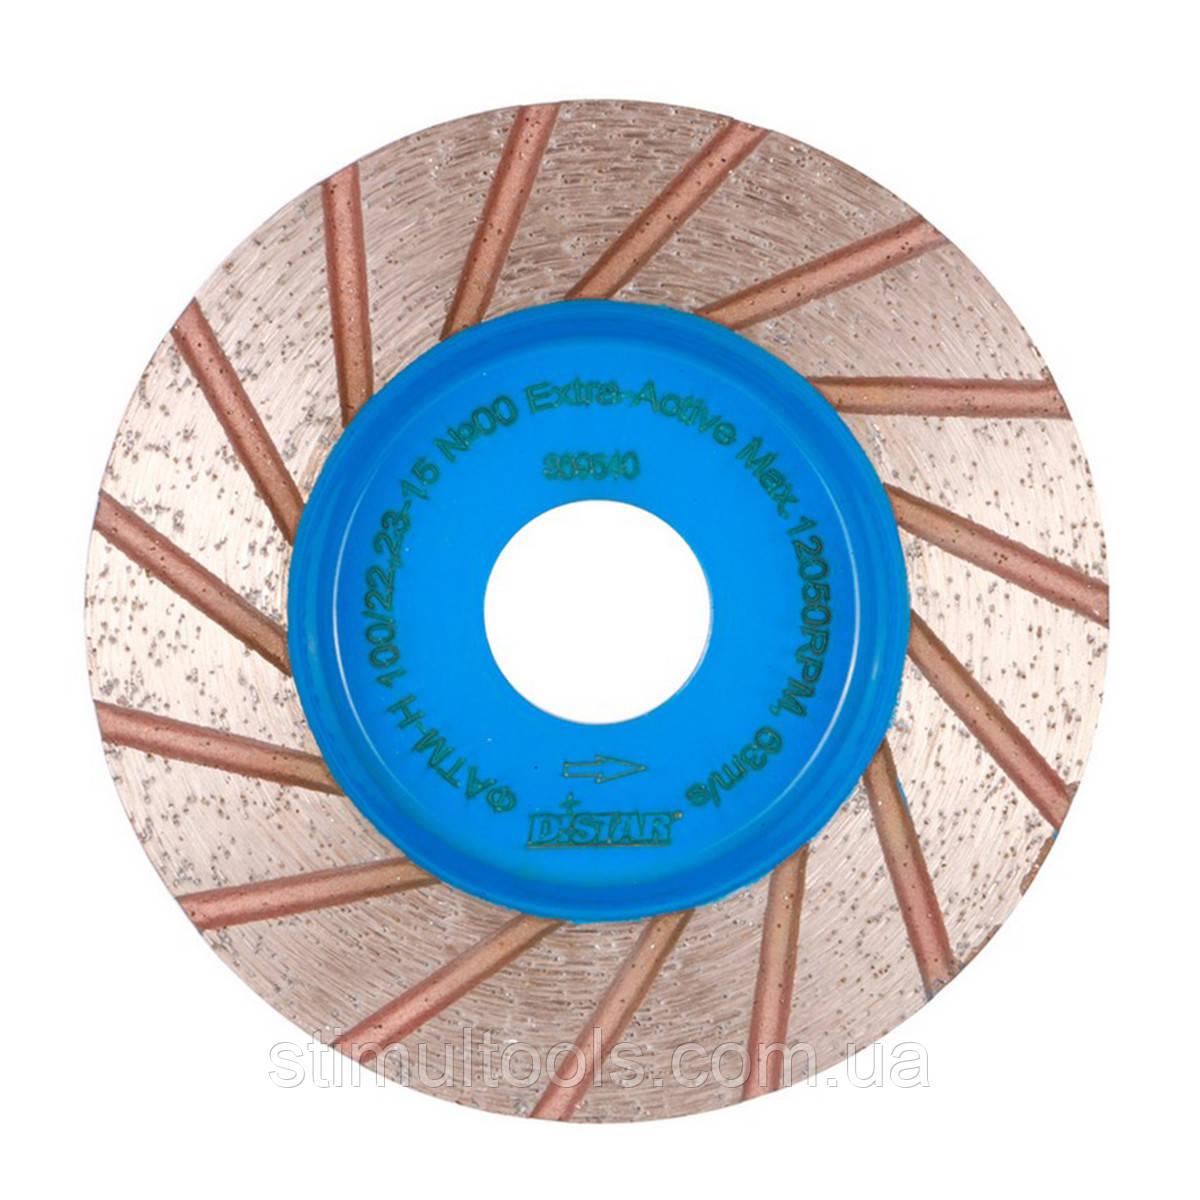 Алмазная фреза Distar DGM-S 100/22,23-15 №00 Extra-Active